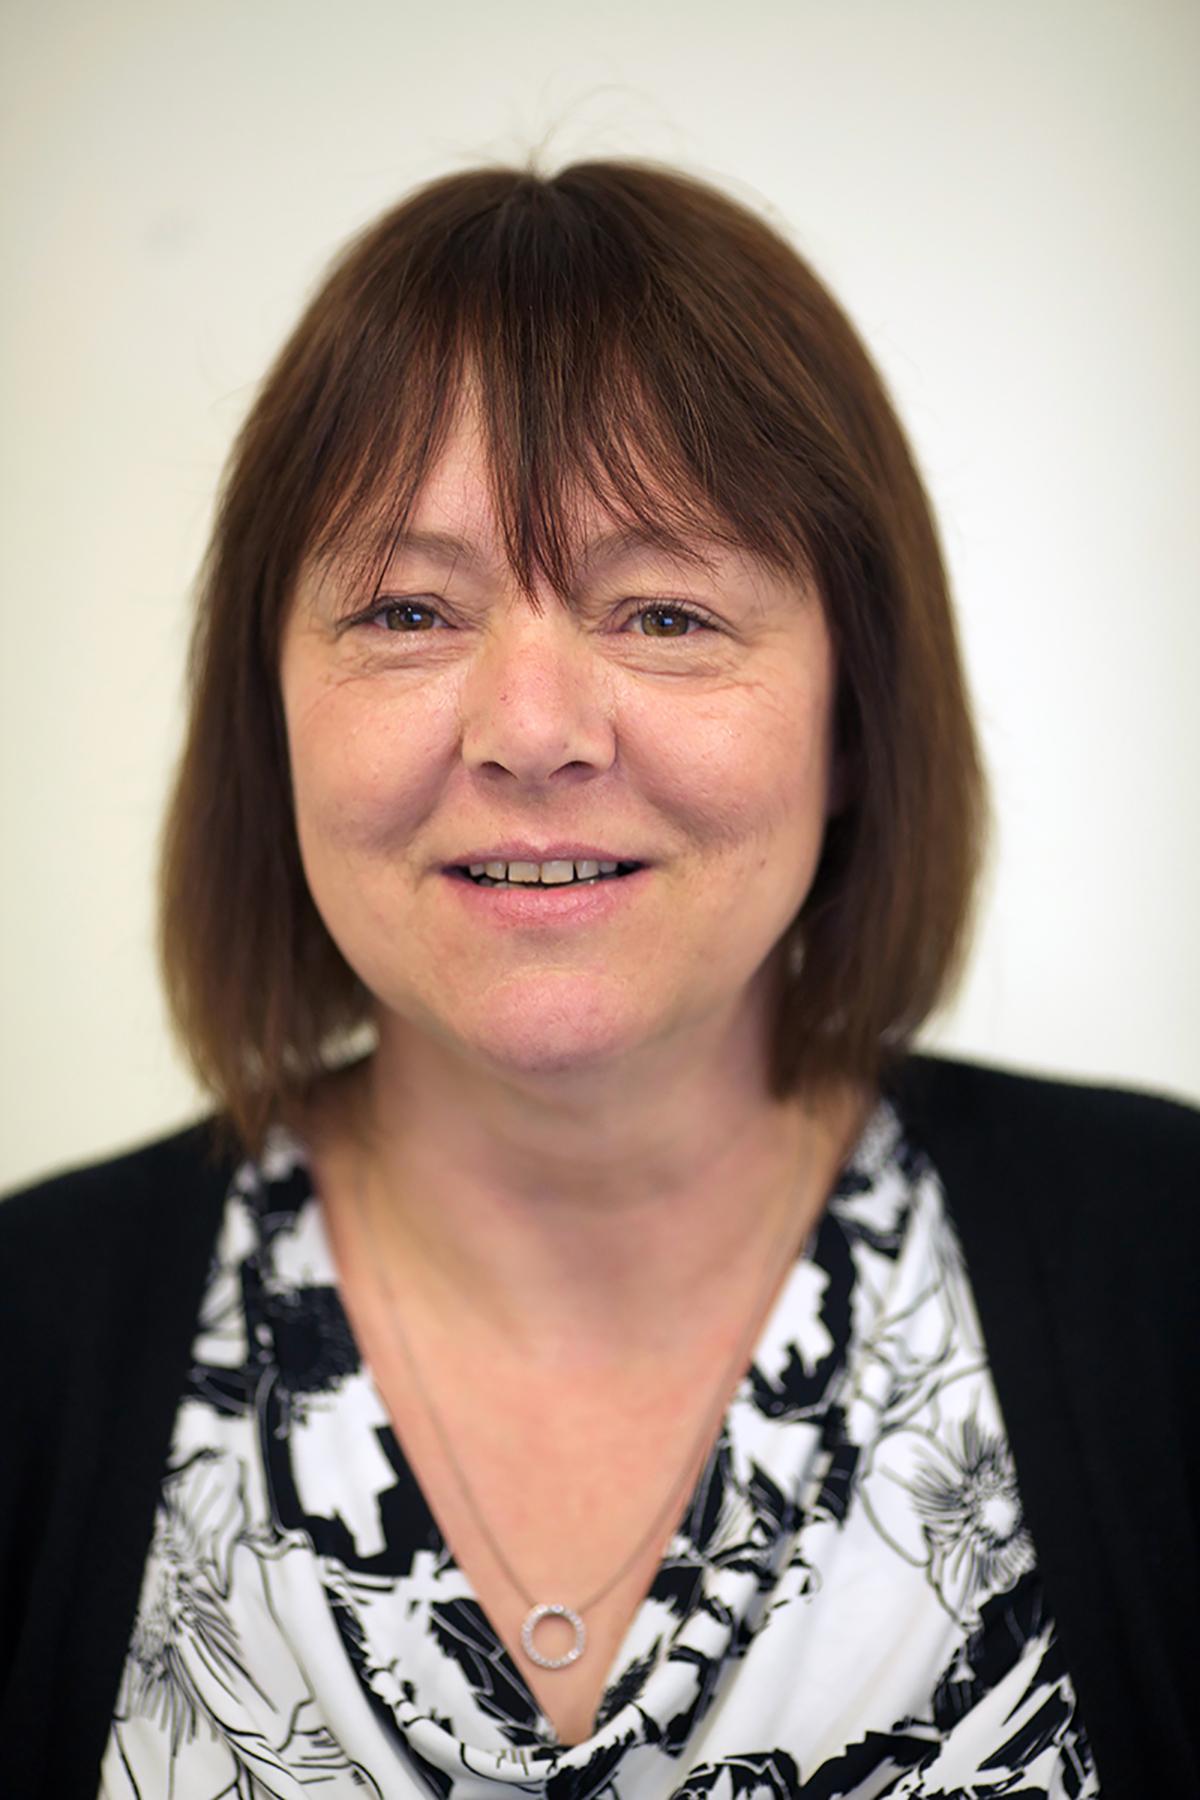 Karen Mclachlan